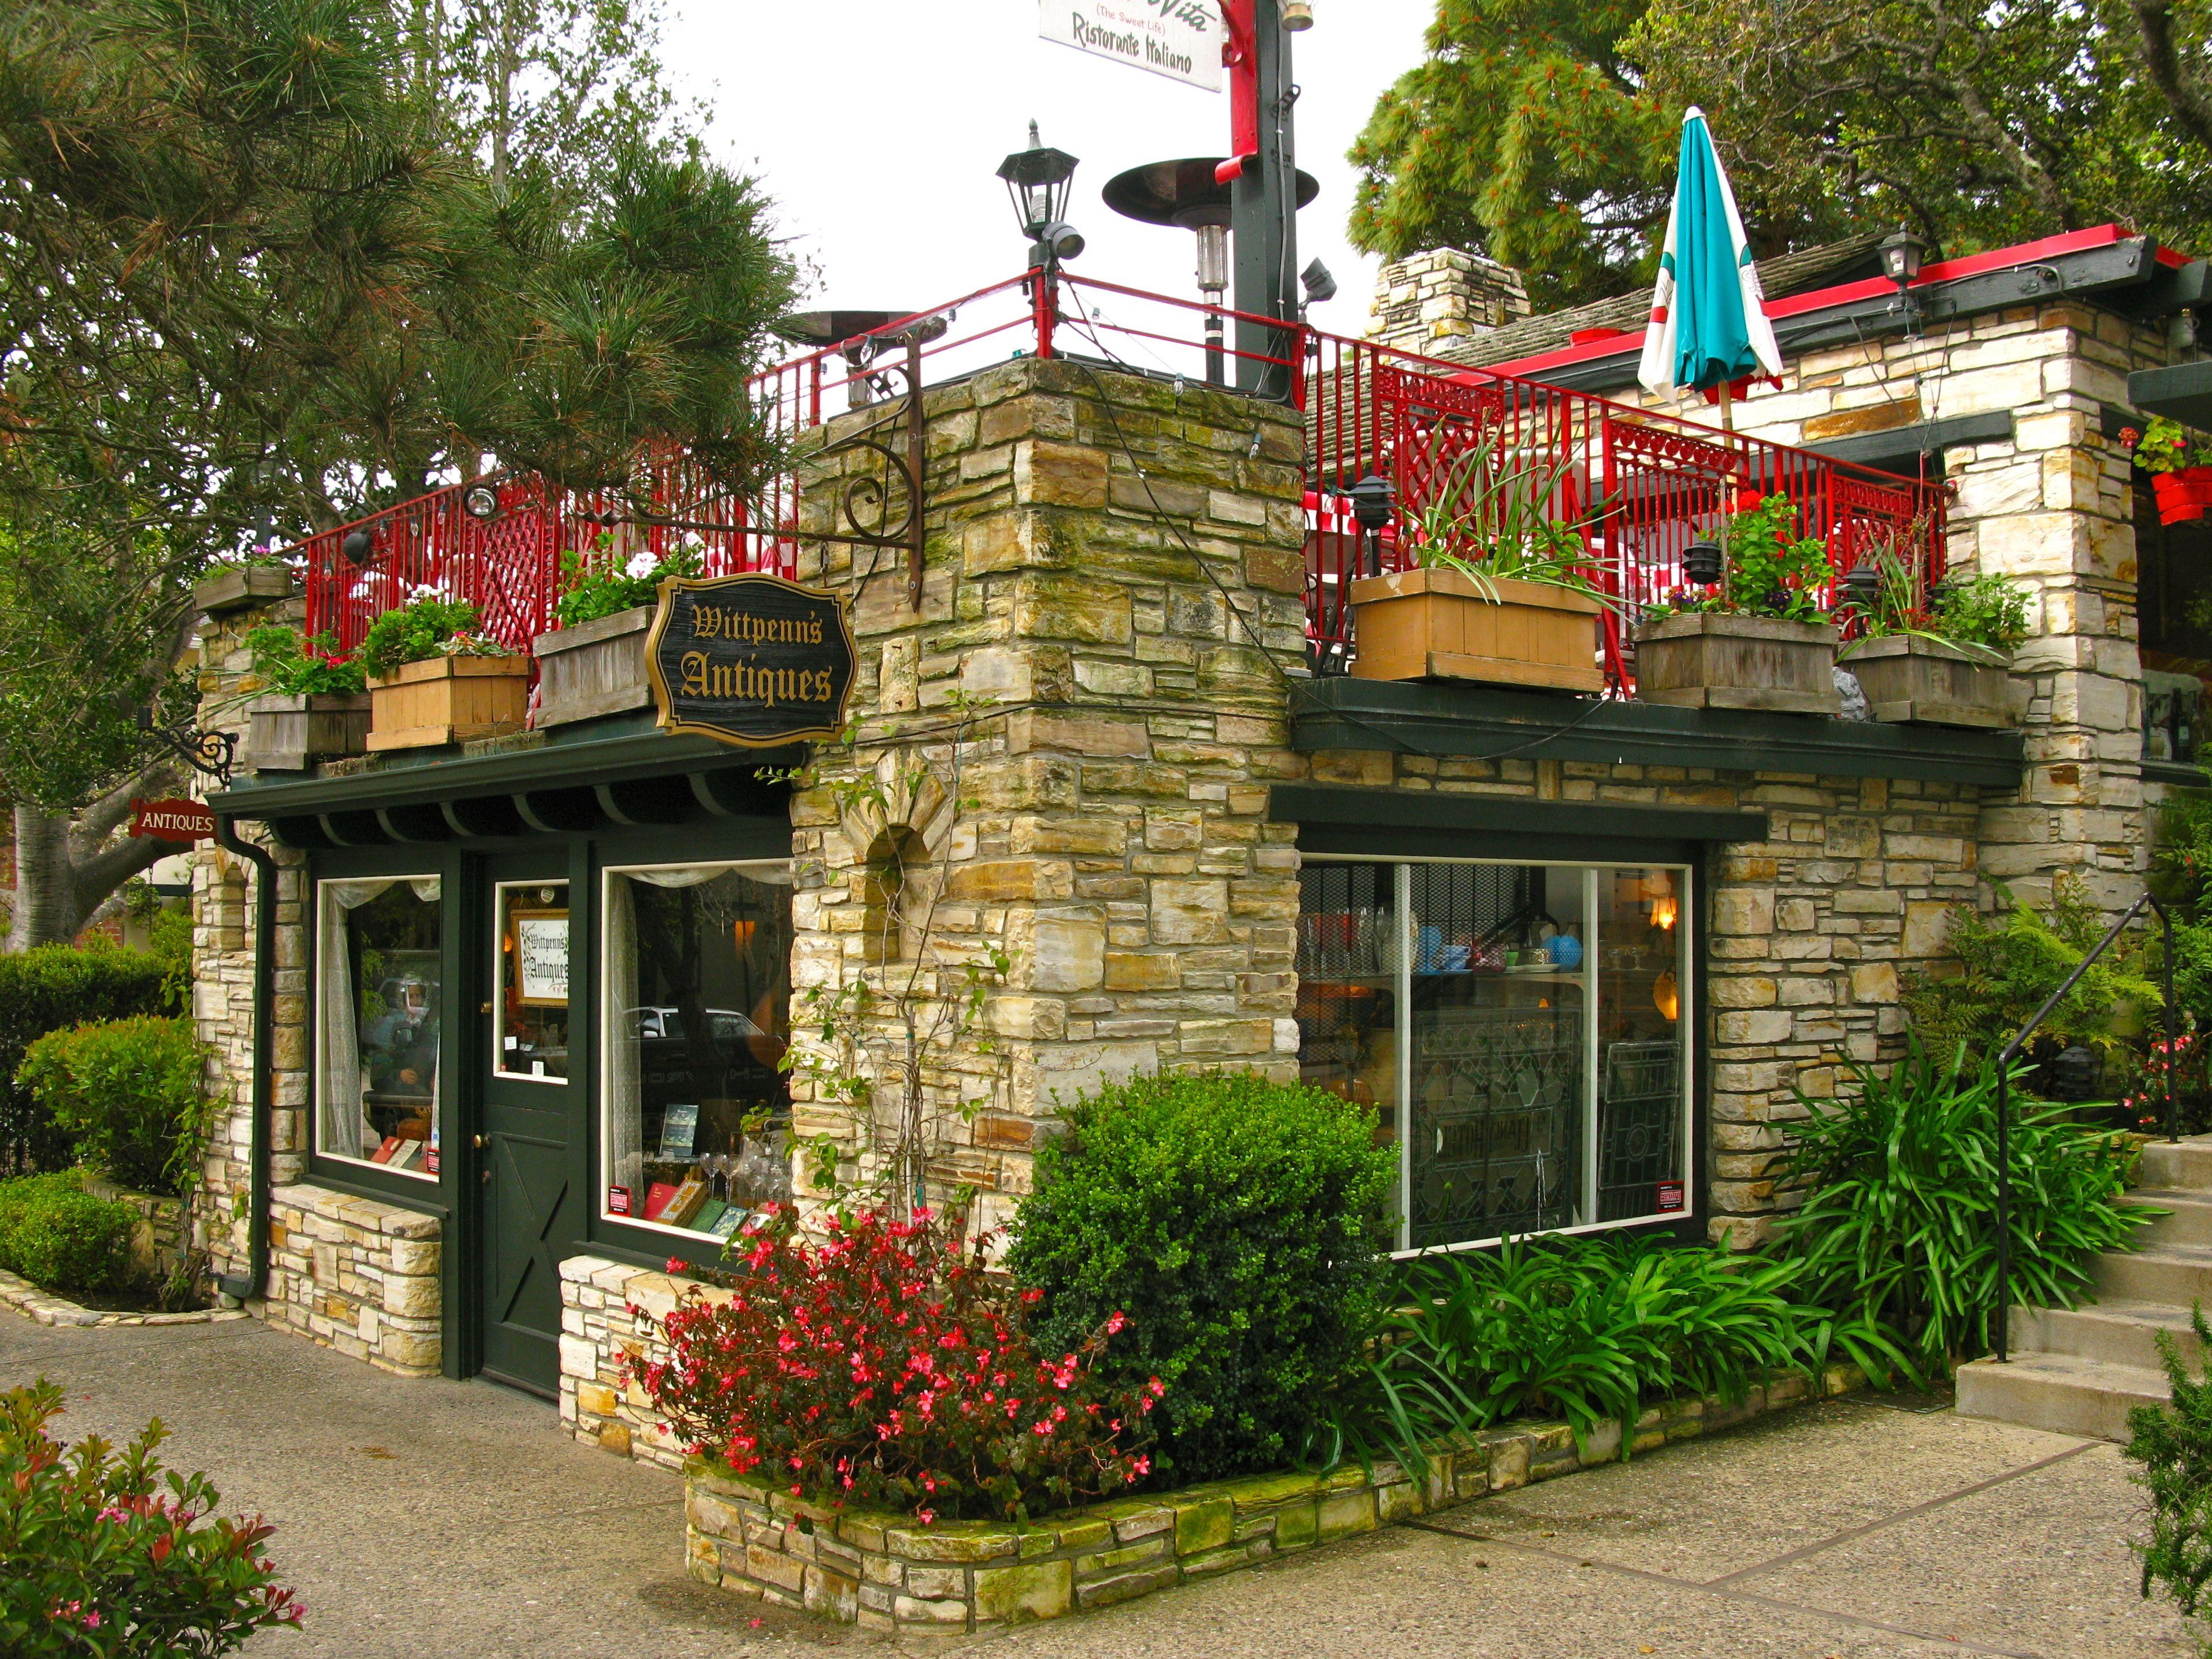 Wittpenn\'s Antiques on the bottom & La Dolce Vita on top (Carmel, CA ...